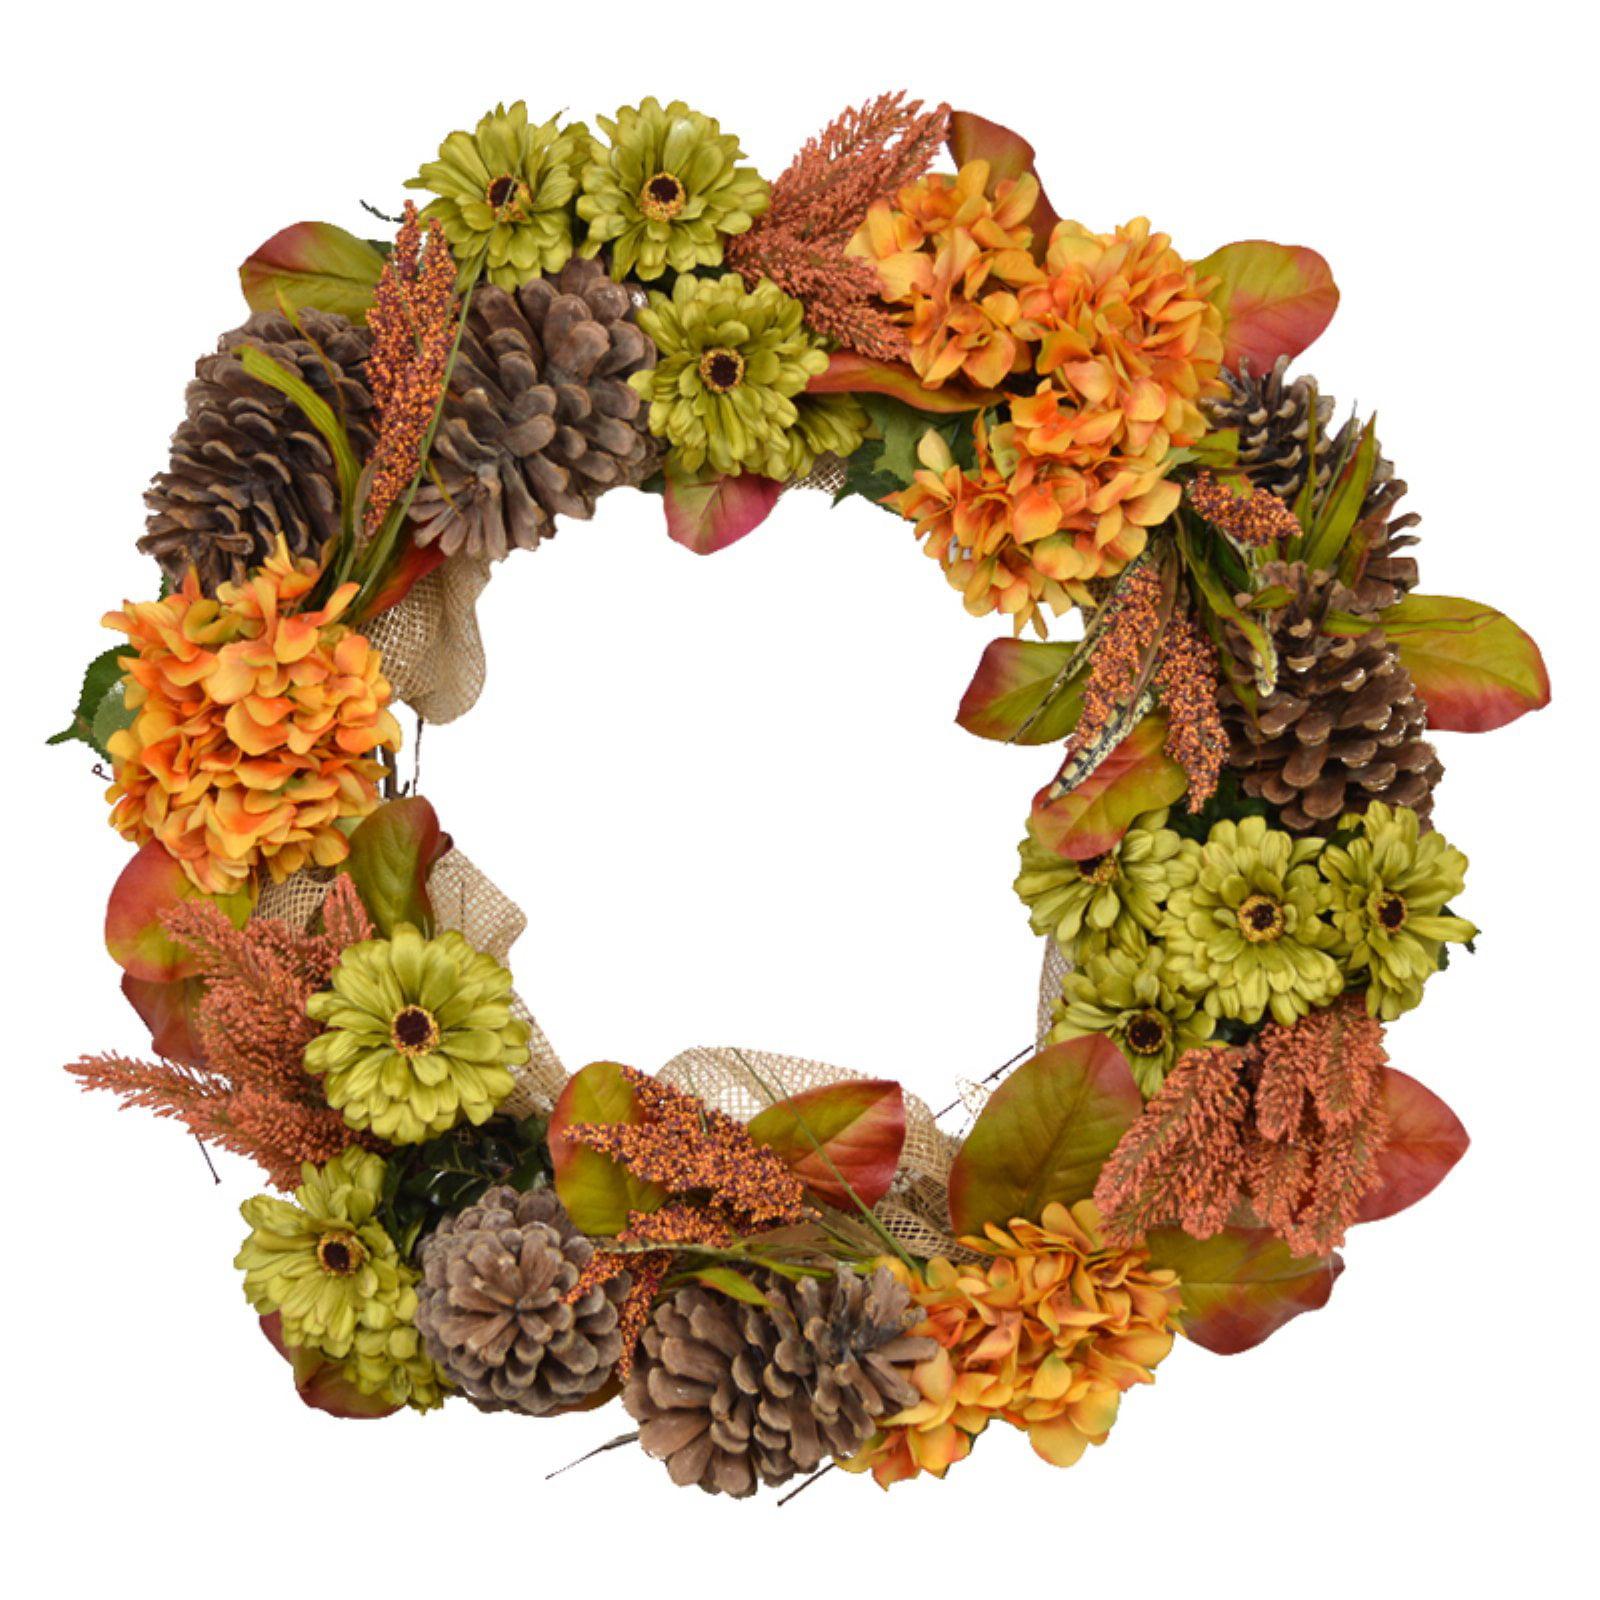 Creative Displays & Designs Artificial Pinecone Daisy And Hydrangea Wreath